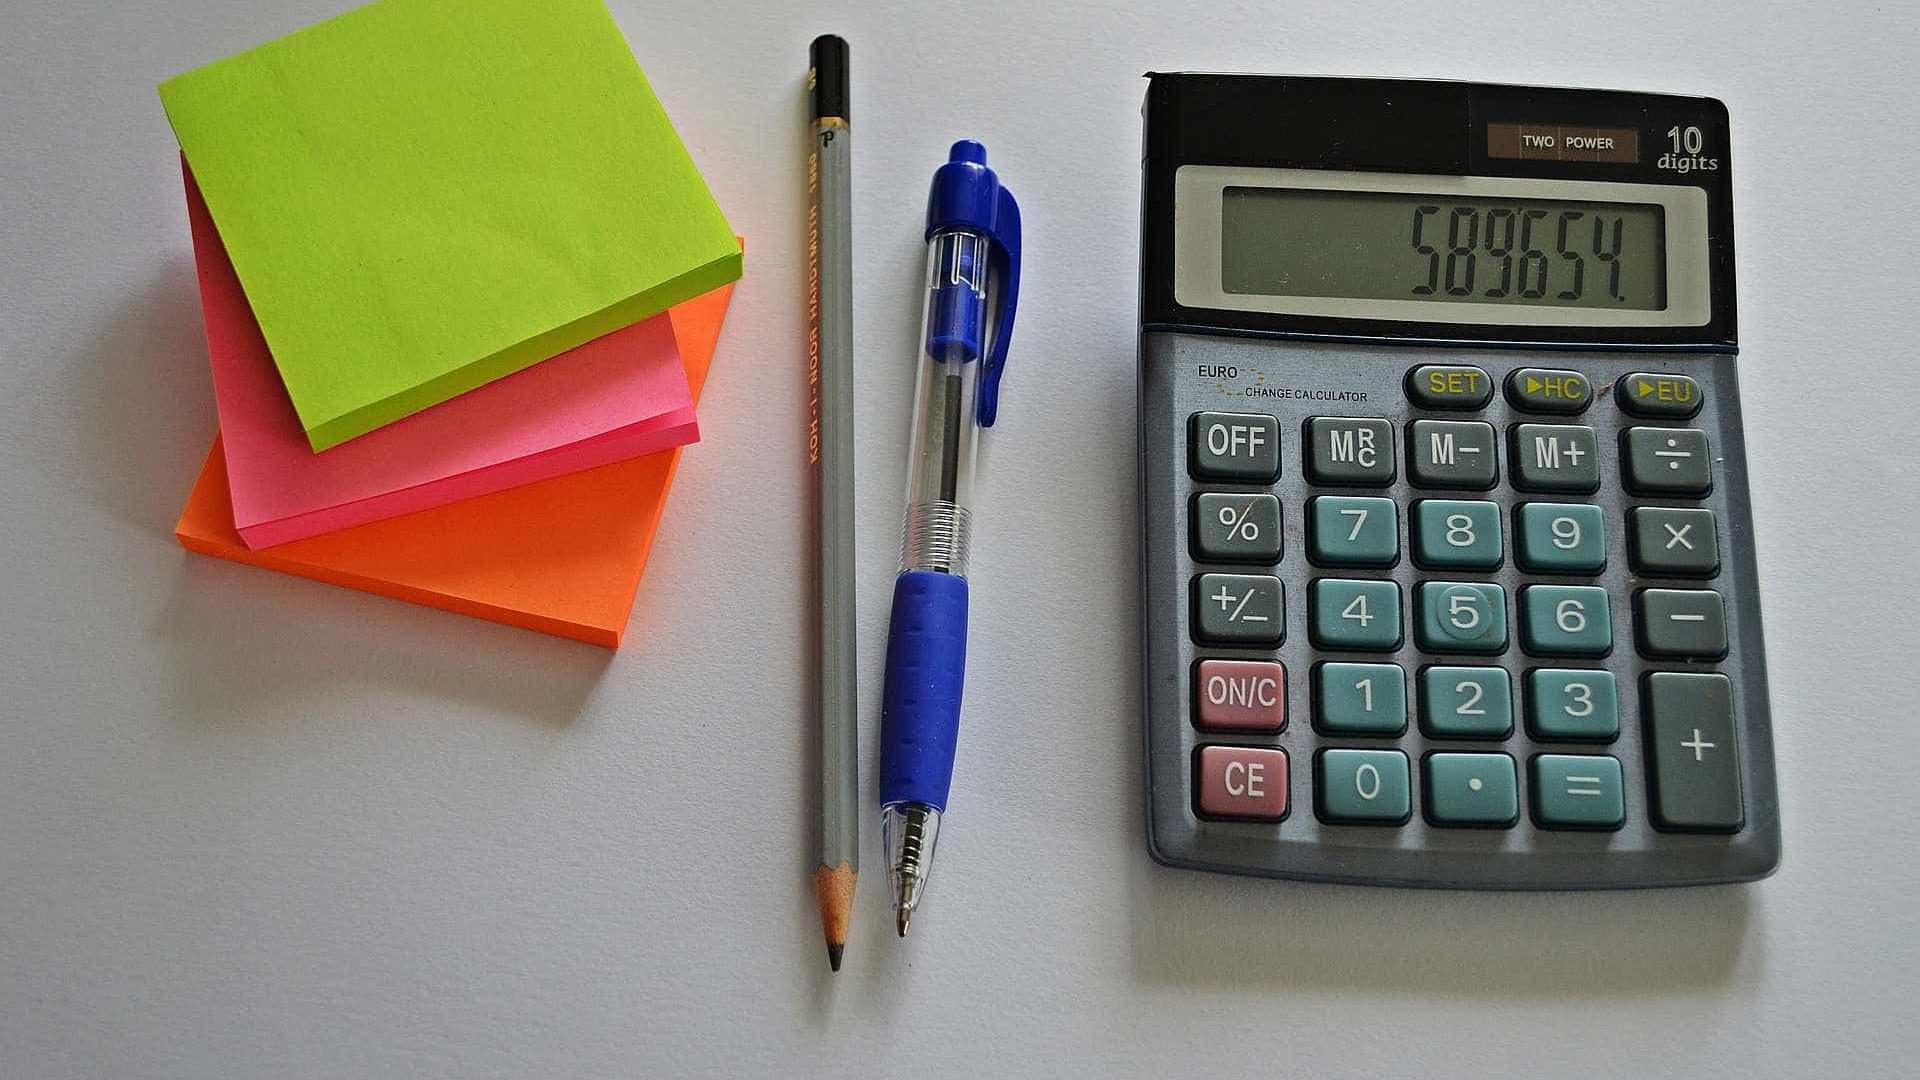 País deve seguir tendência global de cortar impostos, diz Guardia